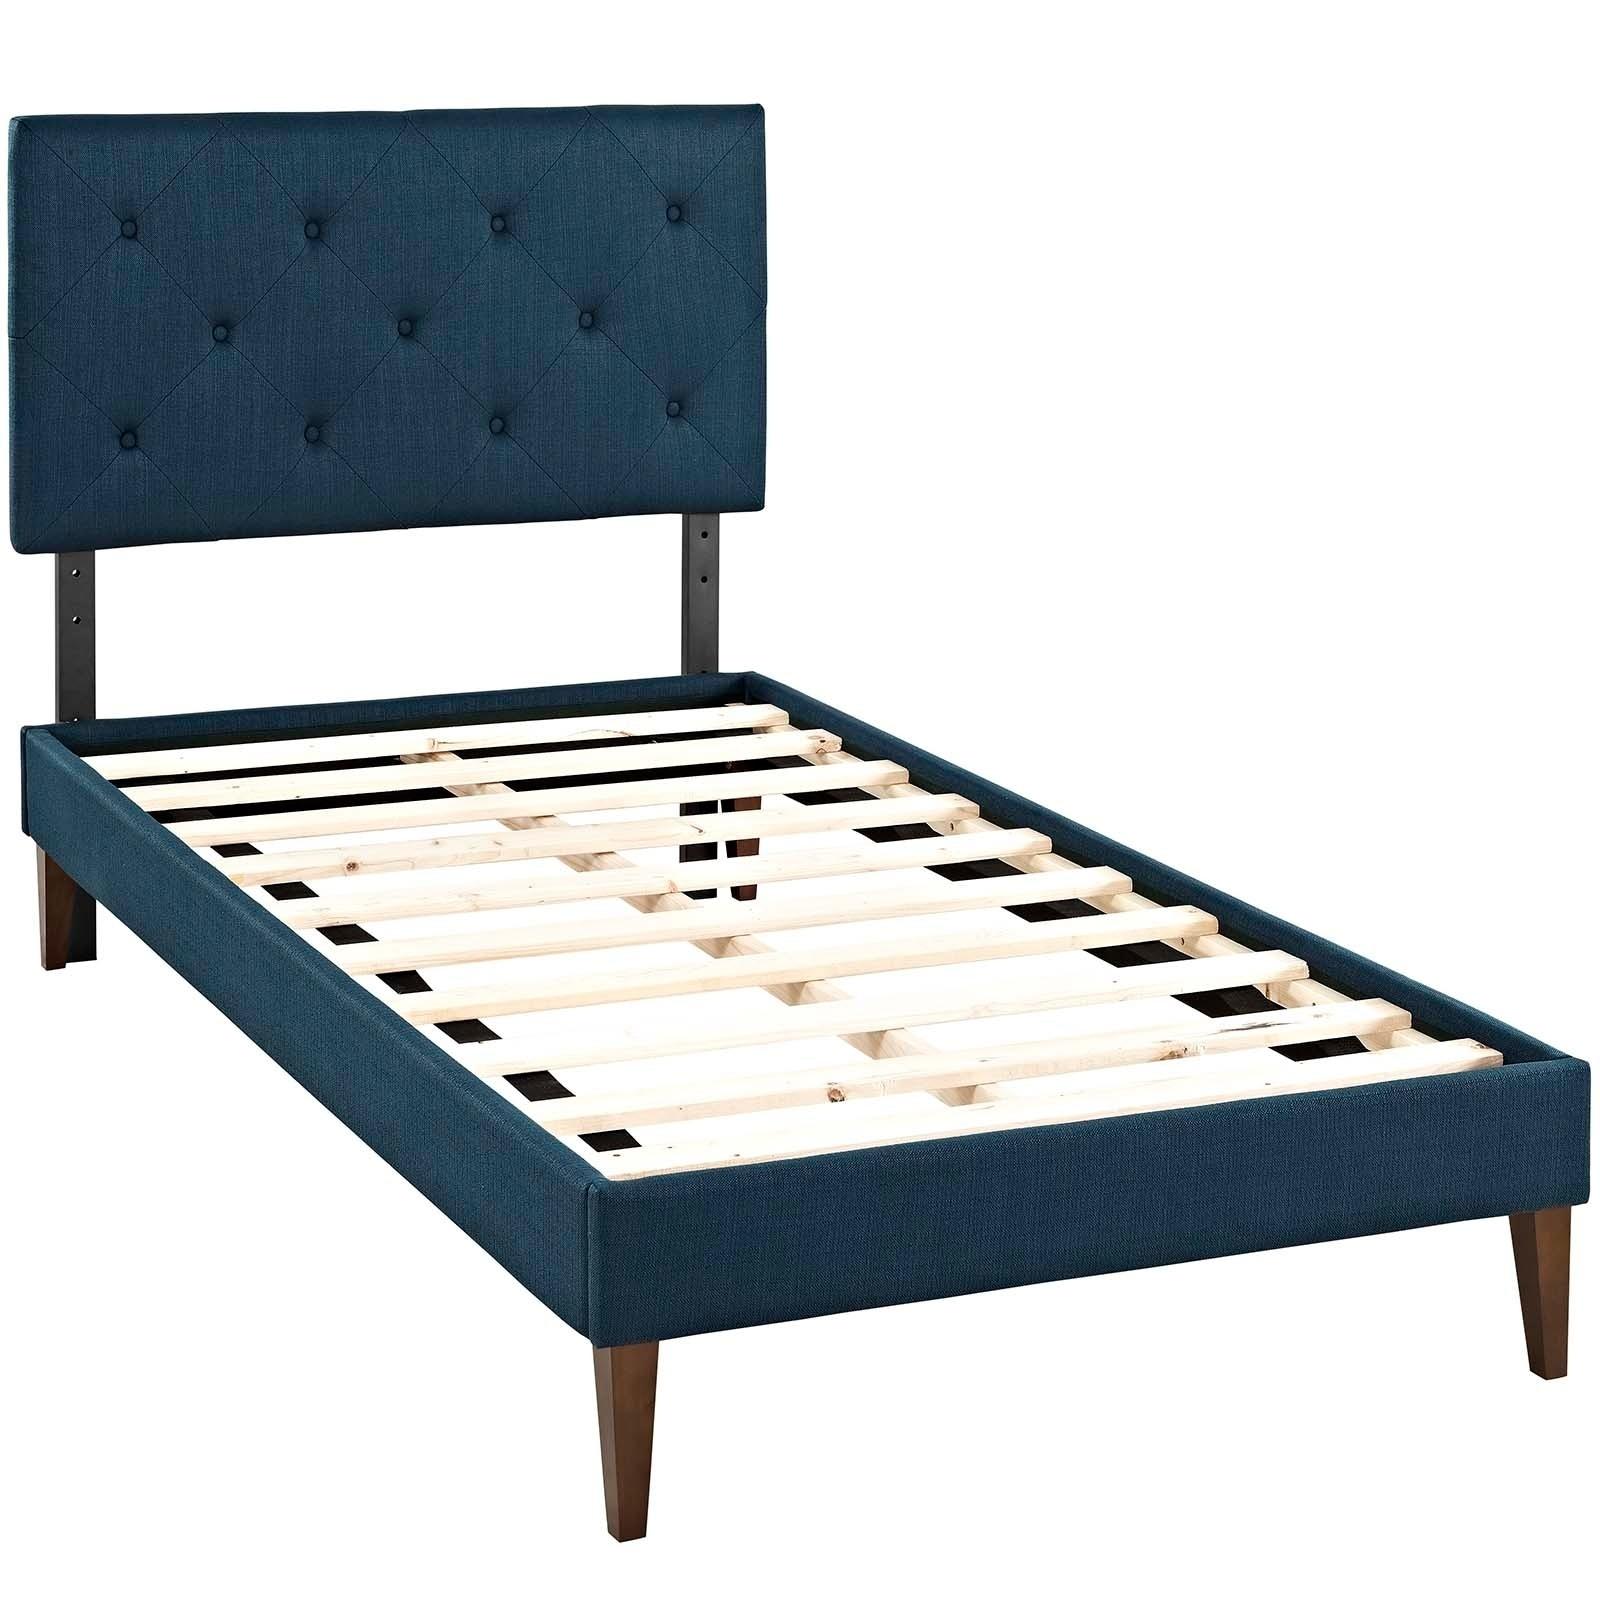 Buy Cream Beds Online at Overstock.com | Our Best Bedroom Furniture ...